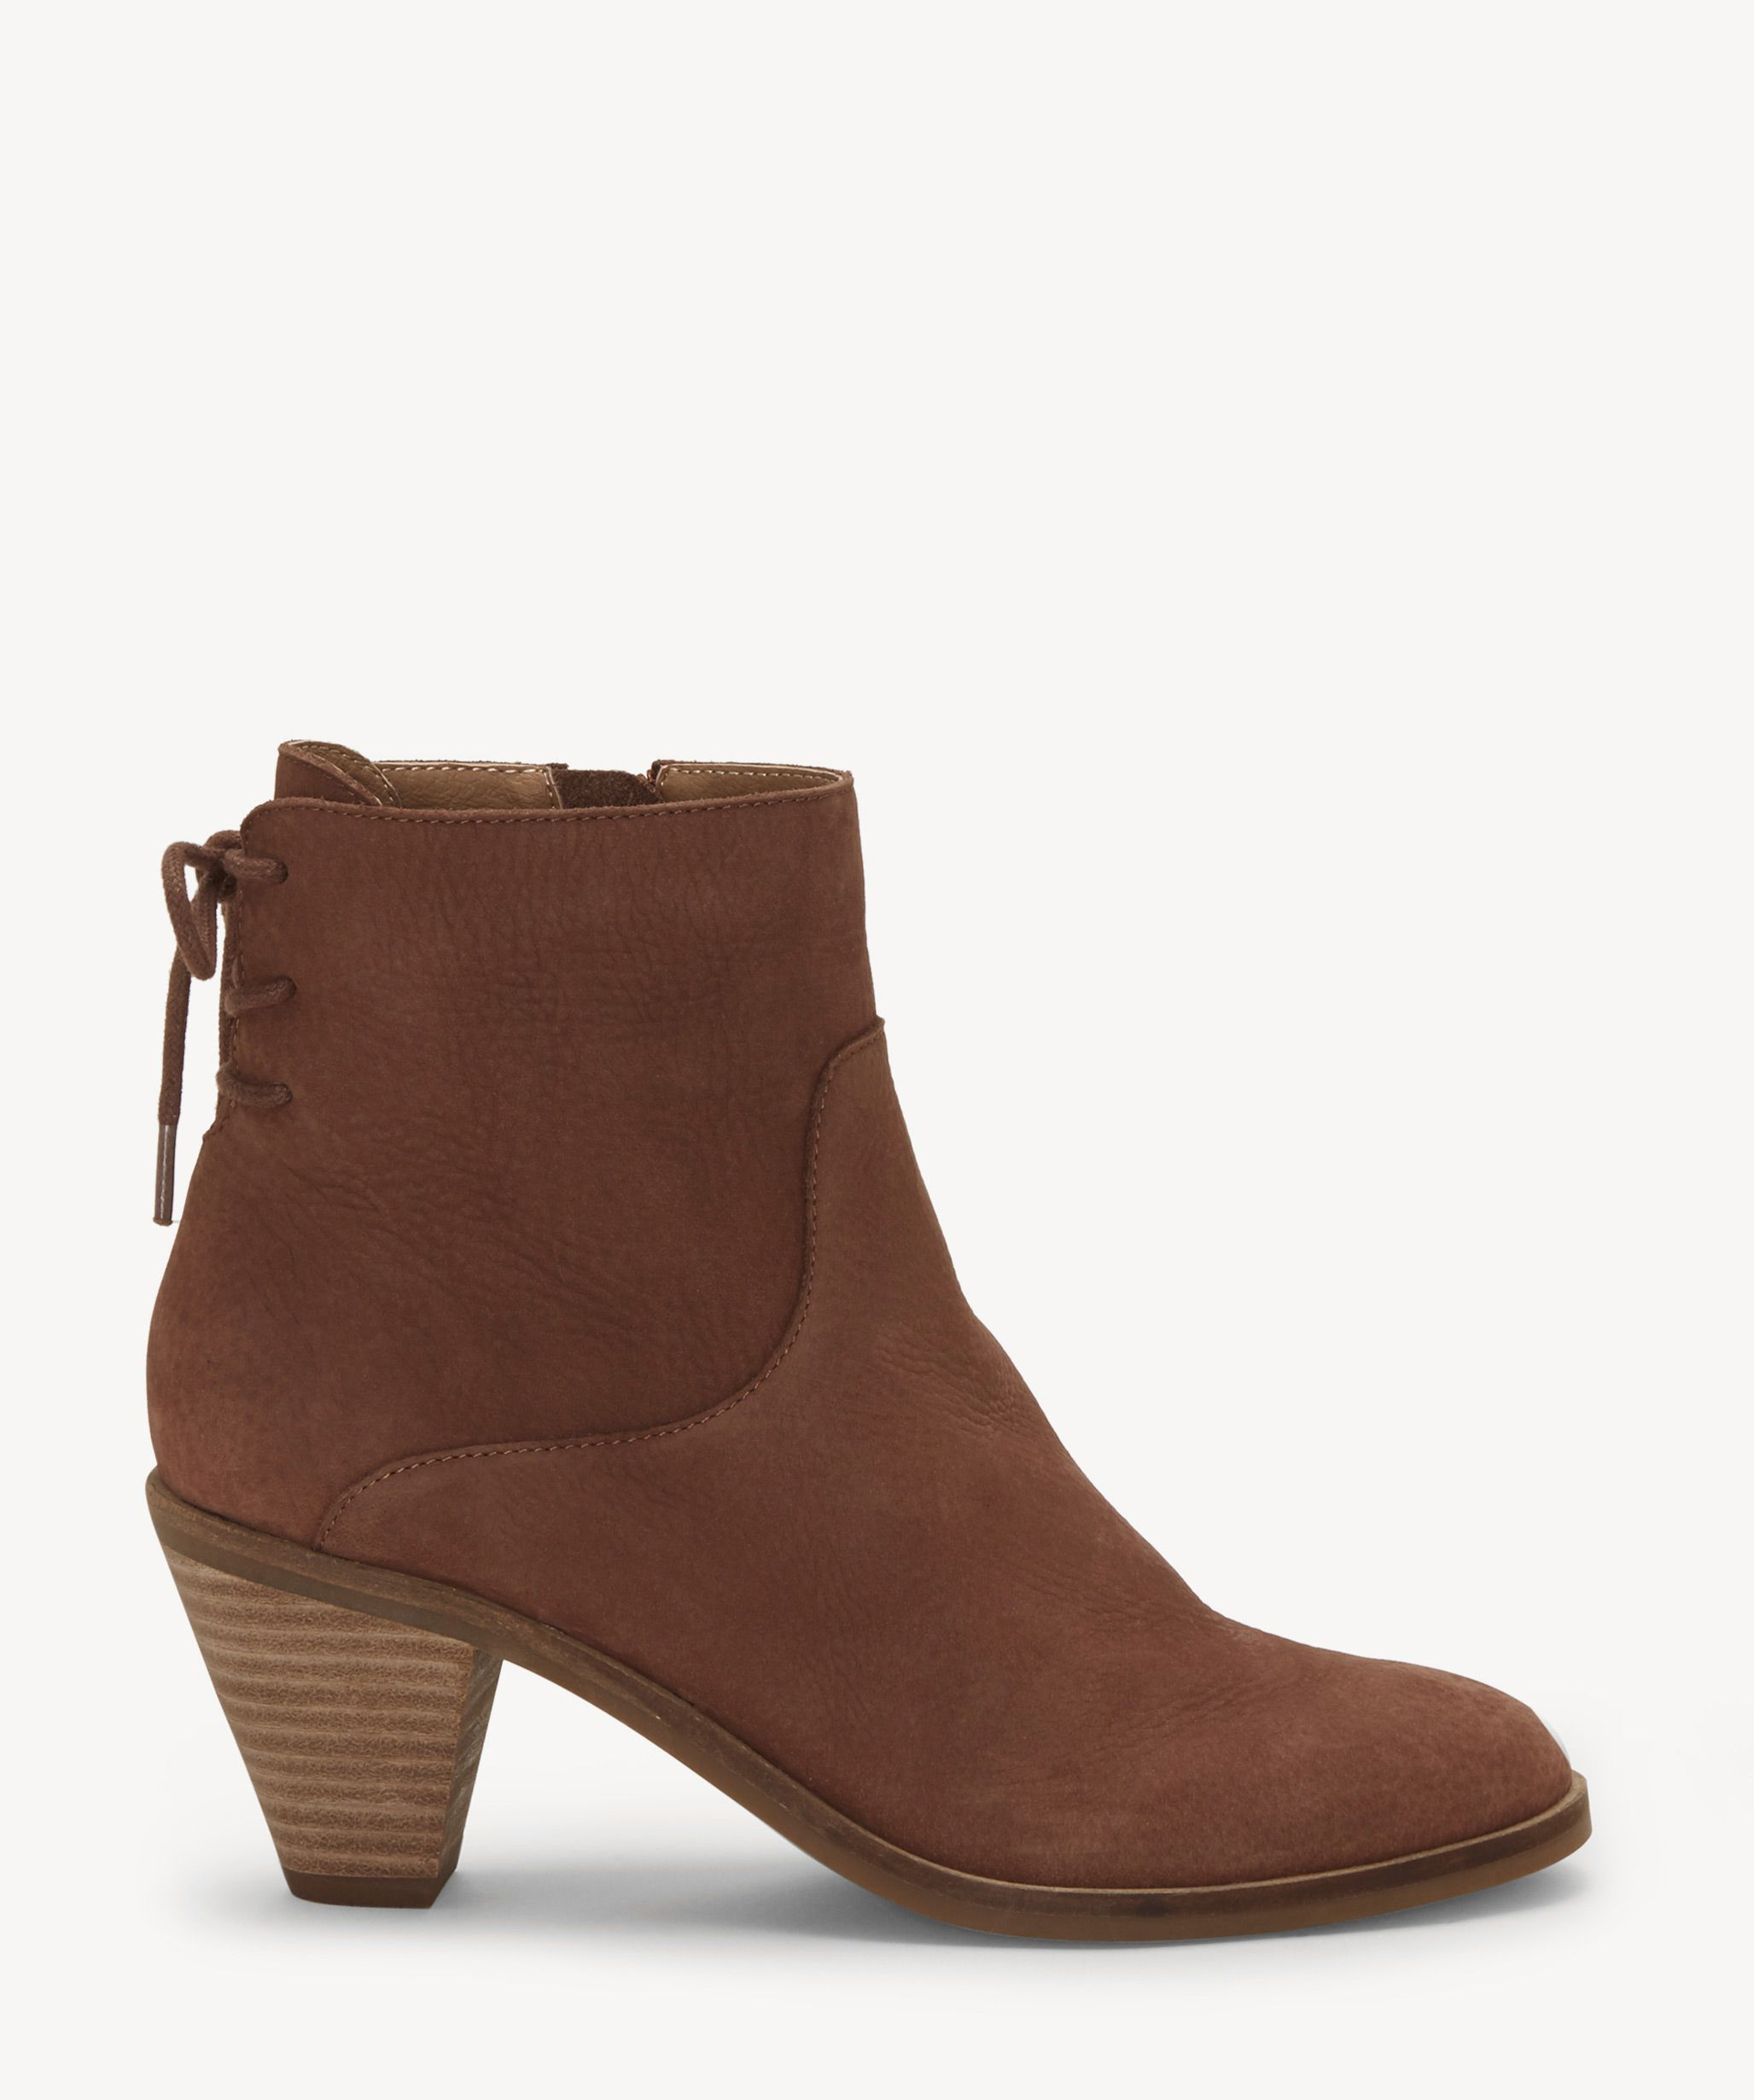 83a33d4c86b Lucky Brand Women s Jalie Cone Heels Bootie Toffee